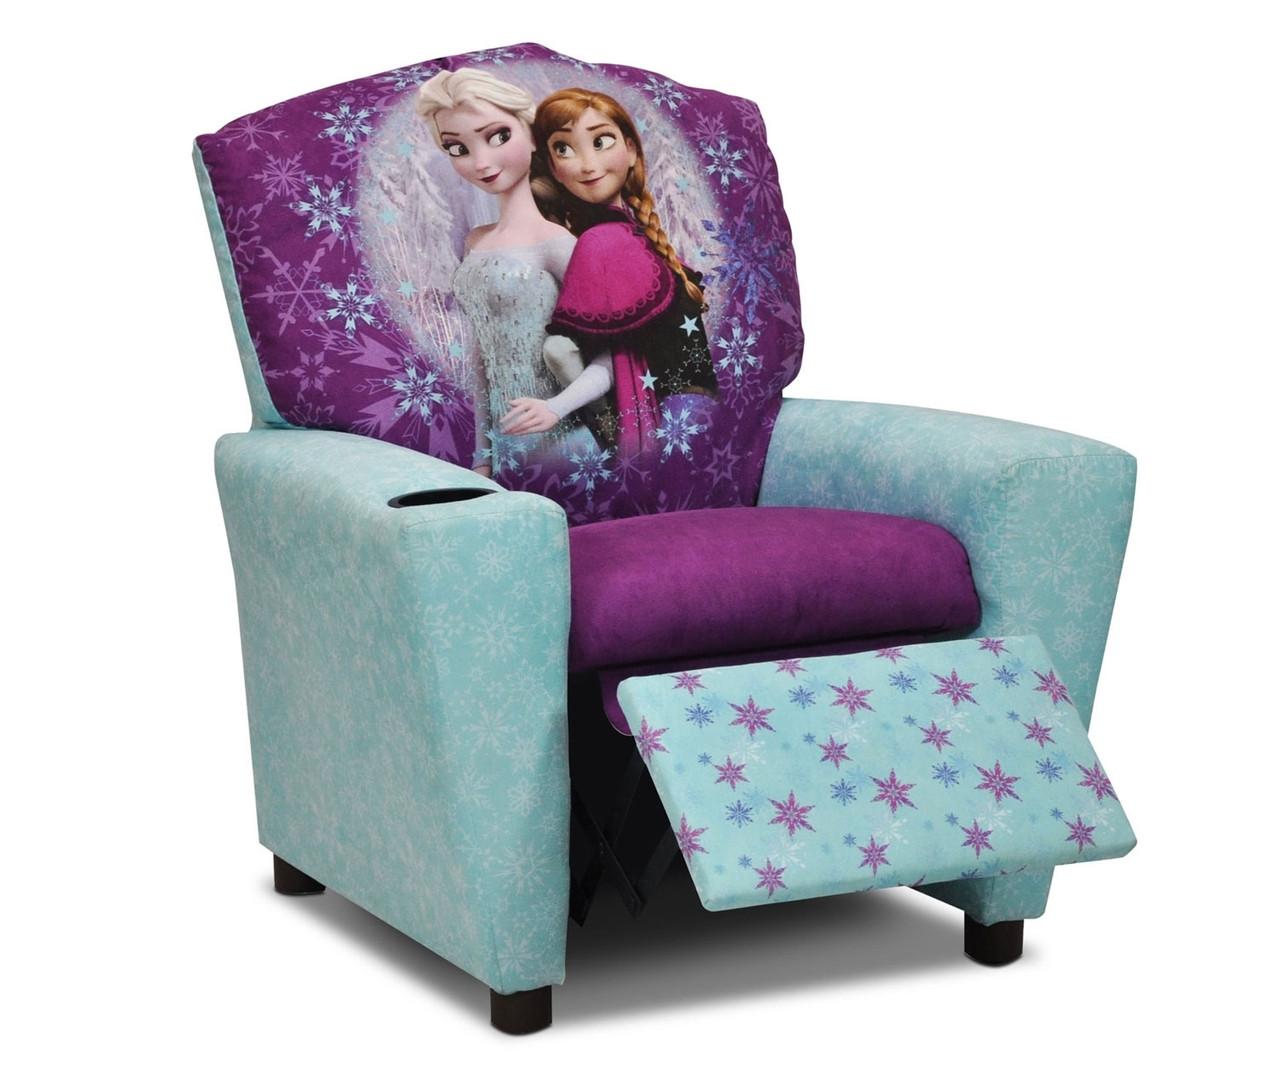 Kidz world disney frozen recliner 1300 dfrozen kidz for Spring hill designs bedroom furniture